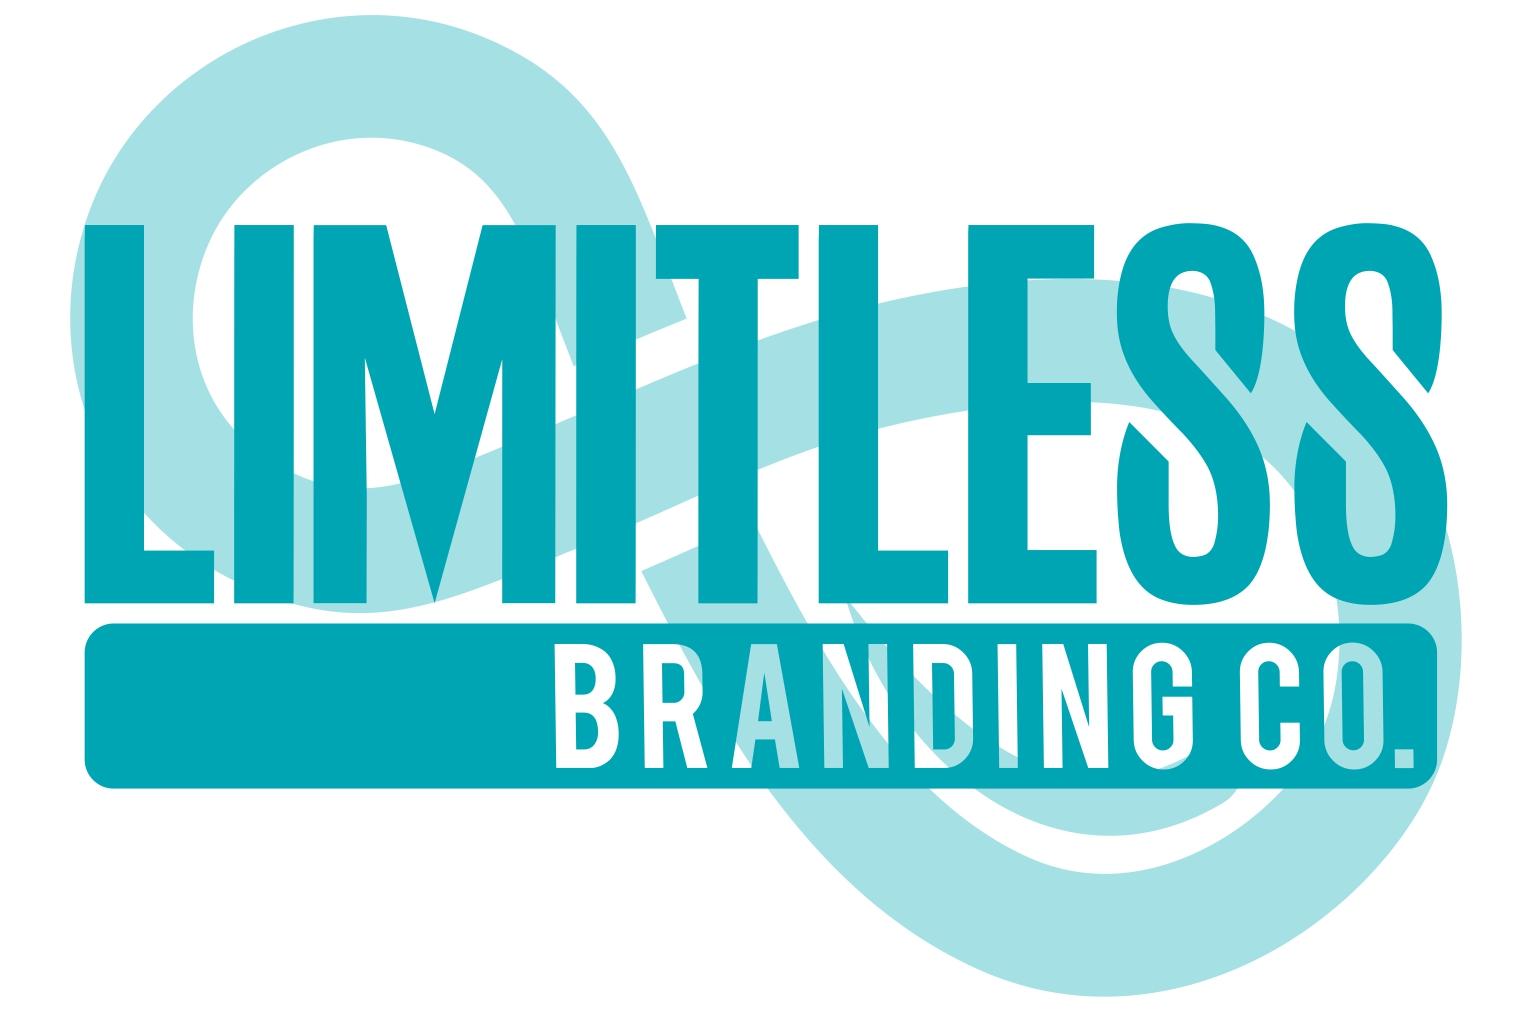 Limitless Branding Co.